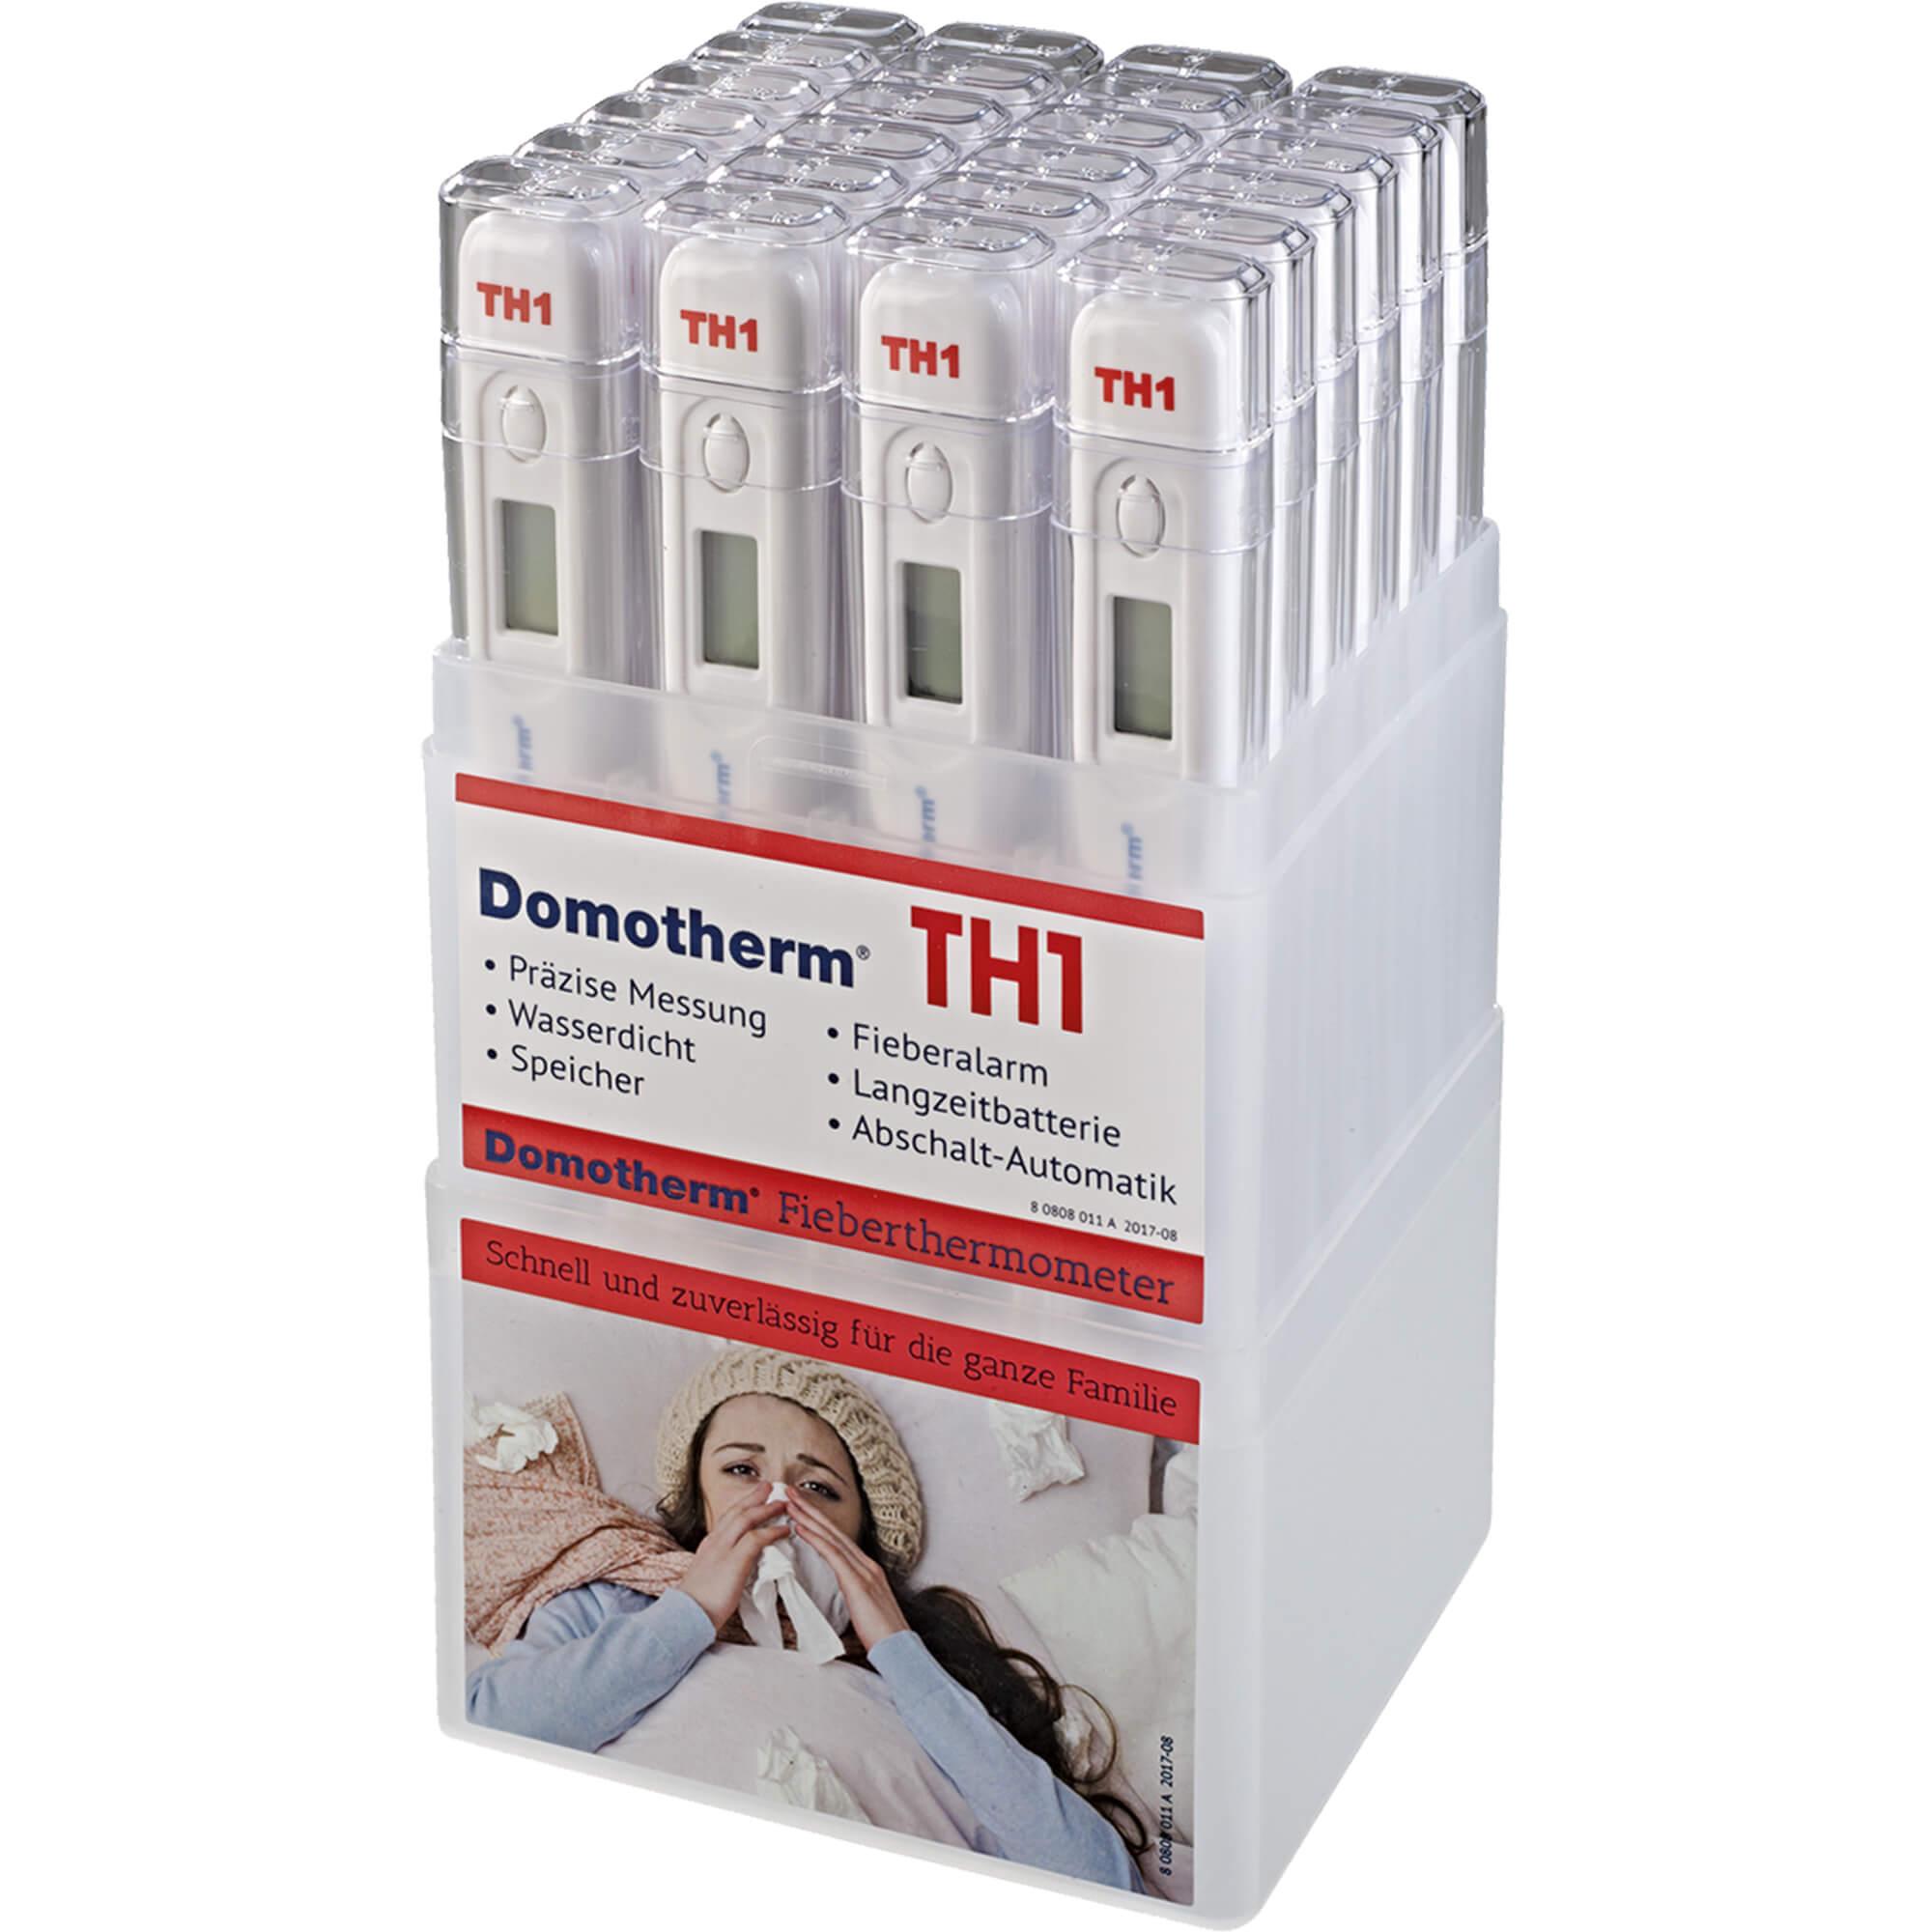 DOMOTHERM TH1 digital Fieberthermometer